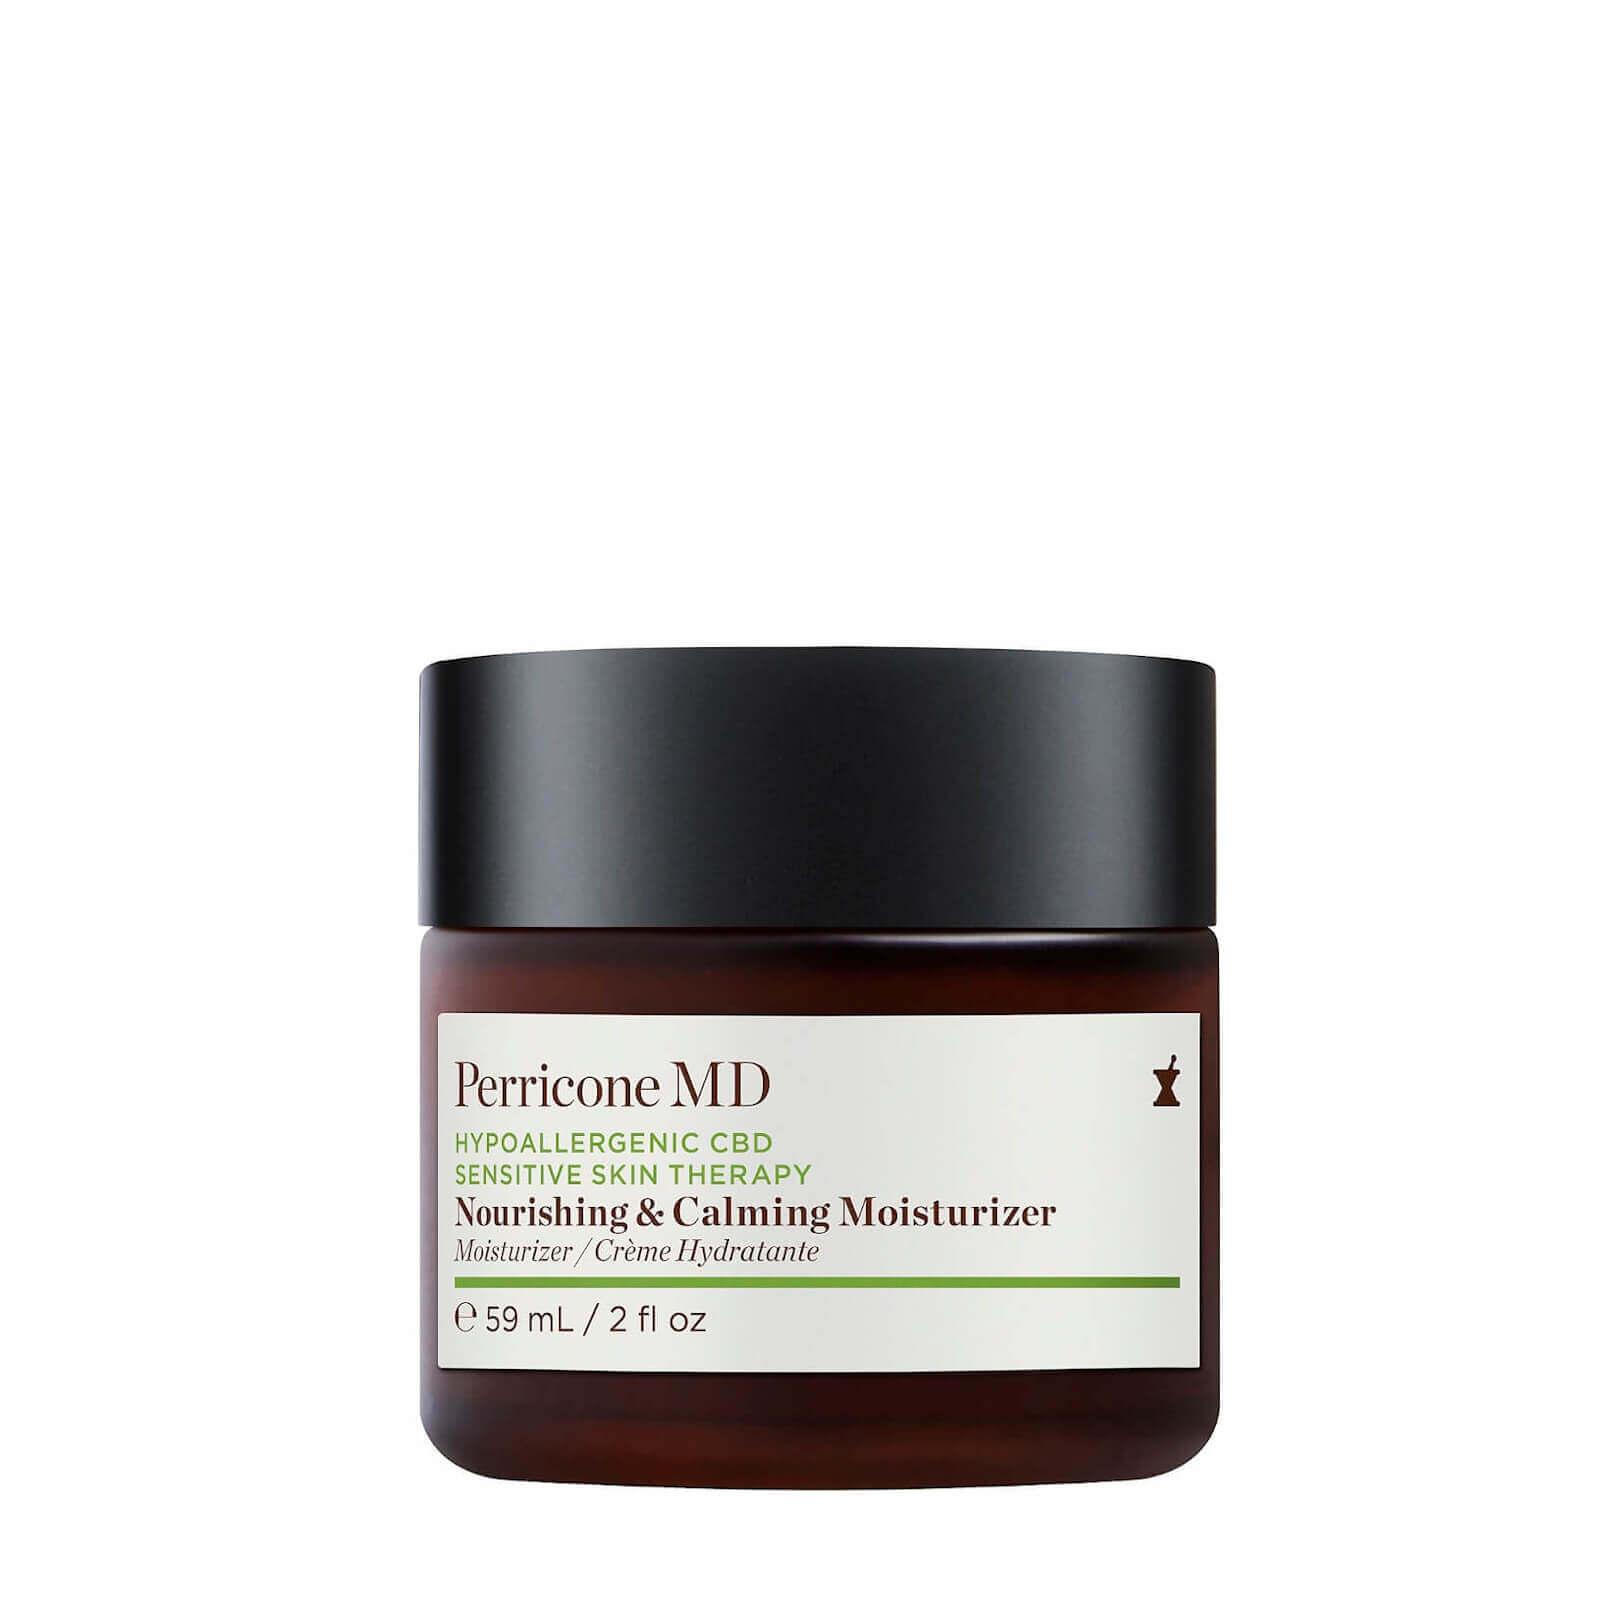 Купить Perricone MD Hypoallergenic CBD Sensitive Skin Therapy Nourishing & Calming Moisturizer 59ml